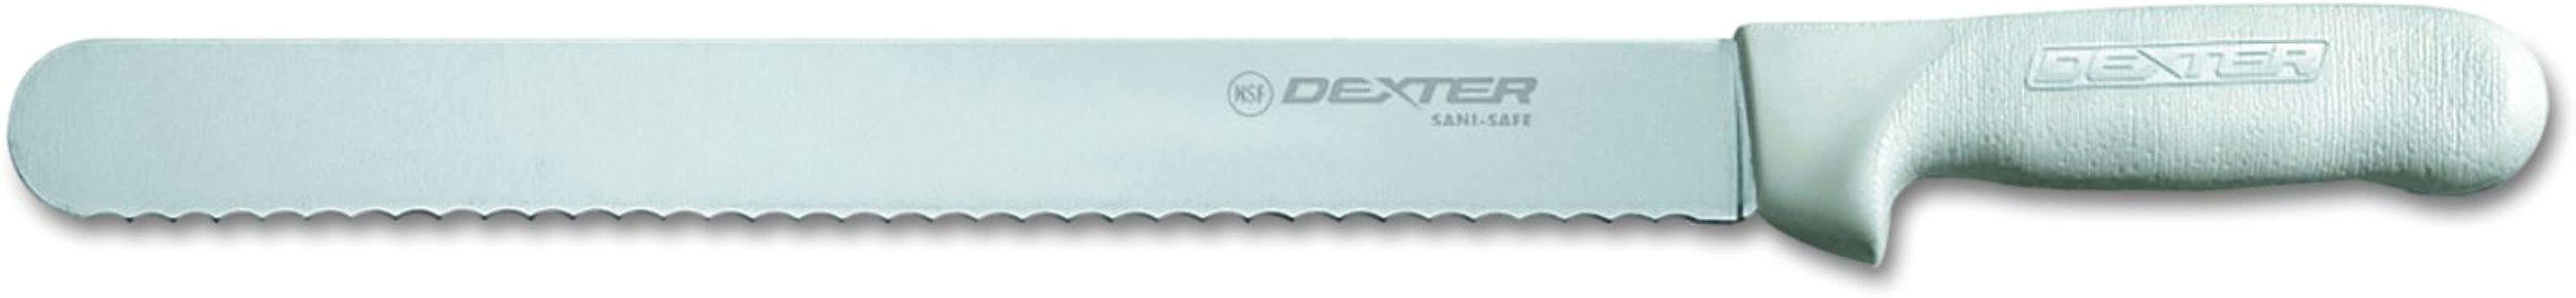 Dexter 13463 12 Inch Silver Sani Safe Scalloped Roast Slicer Knife